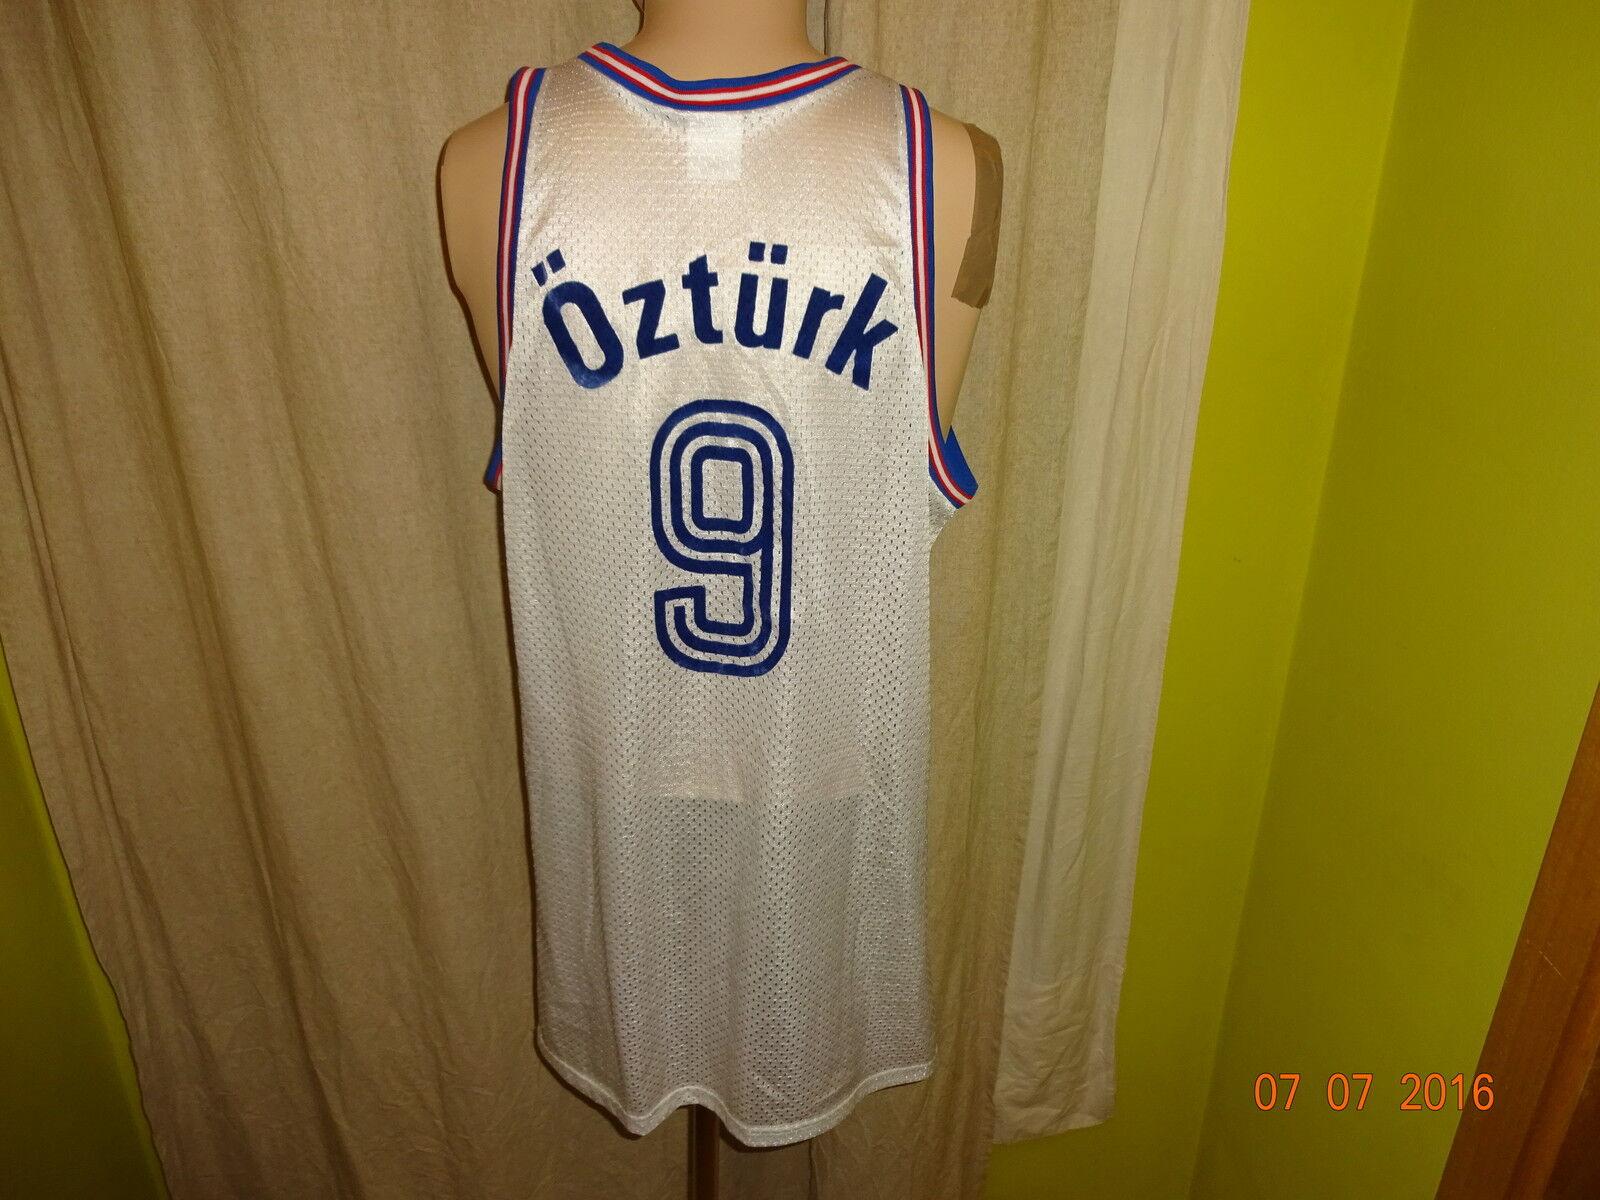 ALBA BERLIN Original Erima maillot 1991-1994  Alba  + Nº 9 Öztürk Größe XL Top